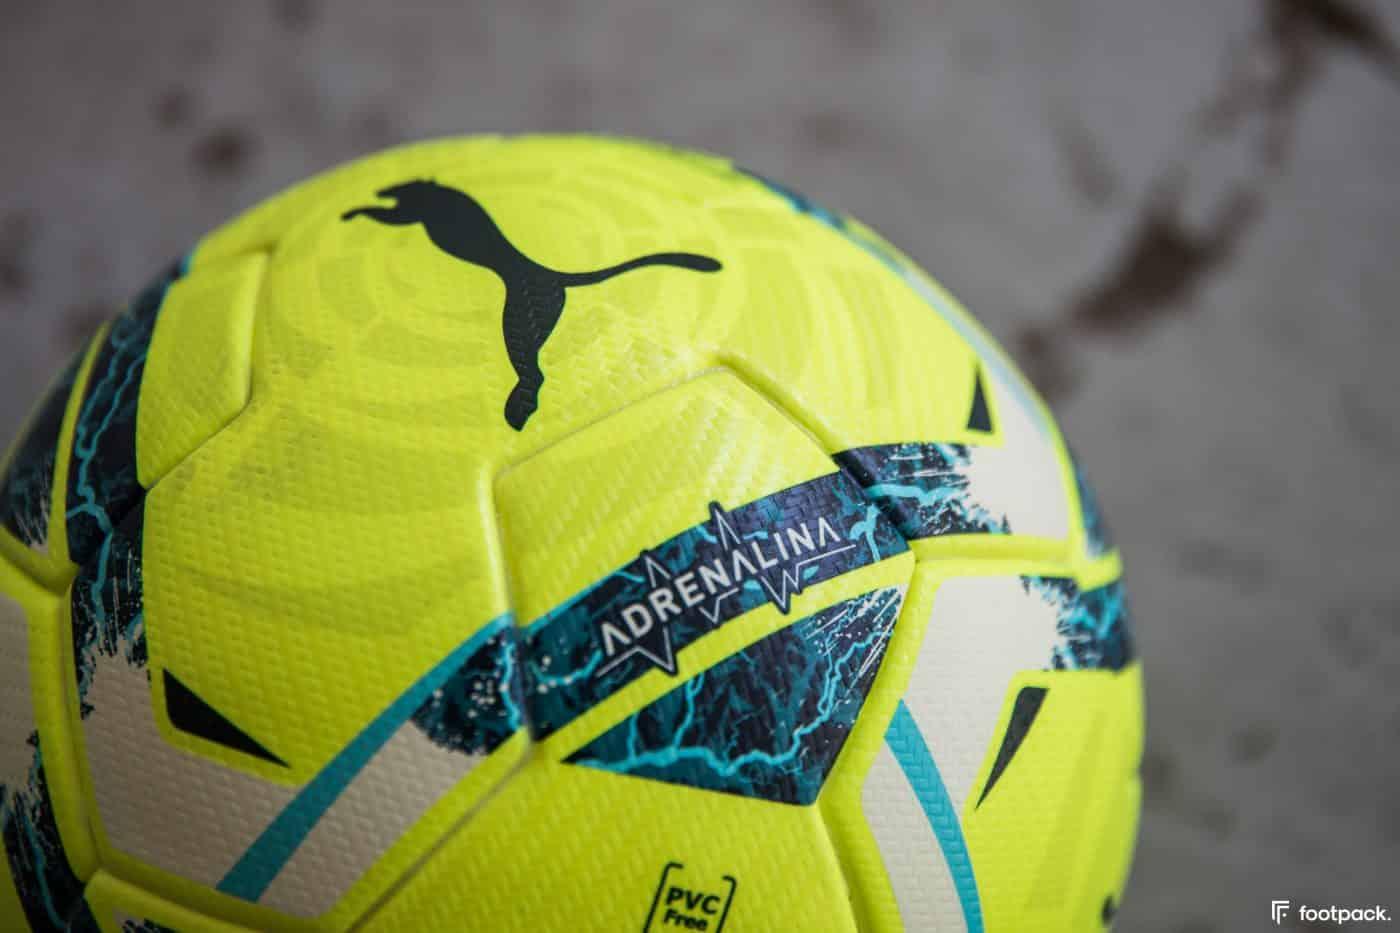 ballon-puma-barcelone-real-madrid-footpack-puma-liga-ball-footapck-1